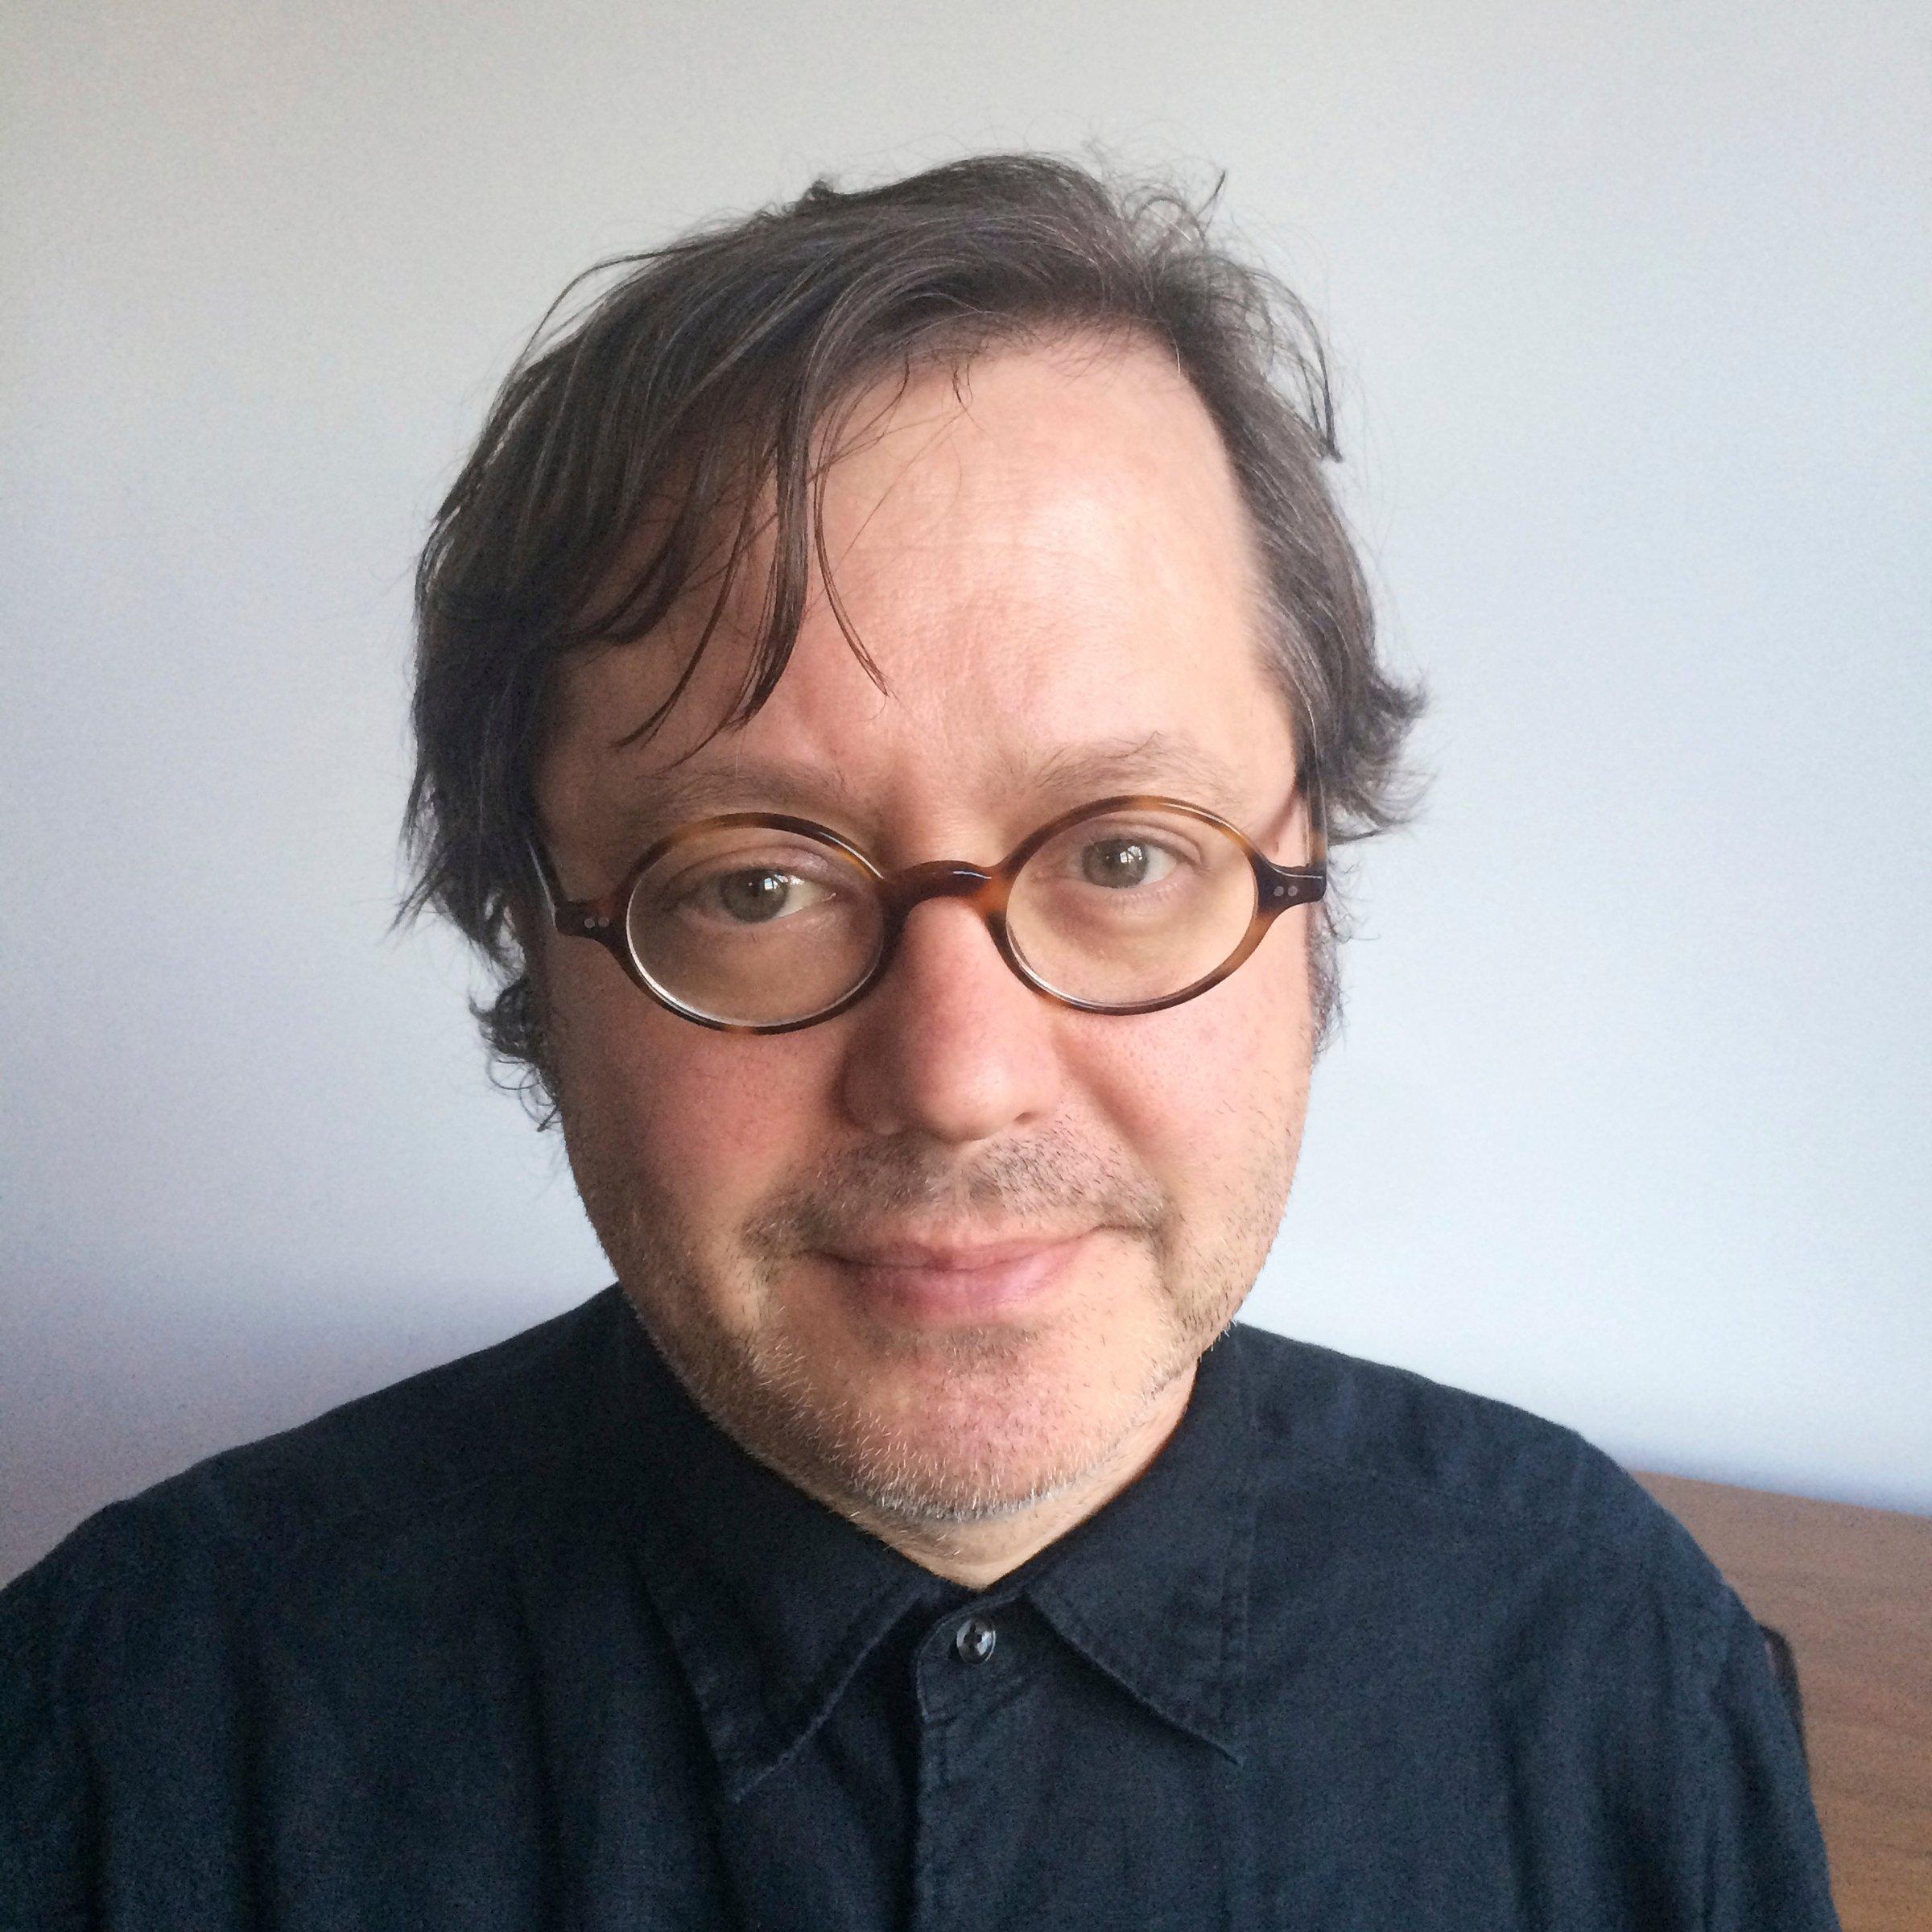 Portrait-Of-Eric-Weeks